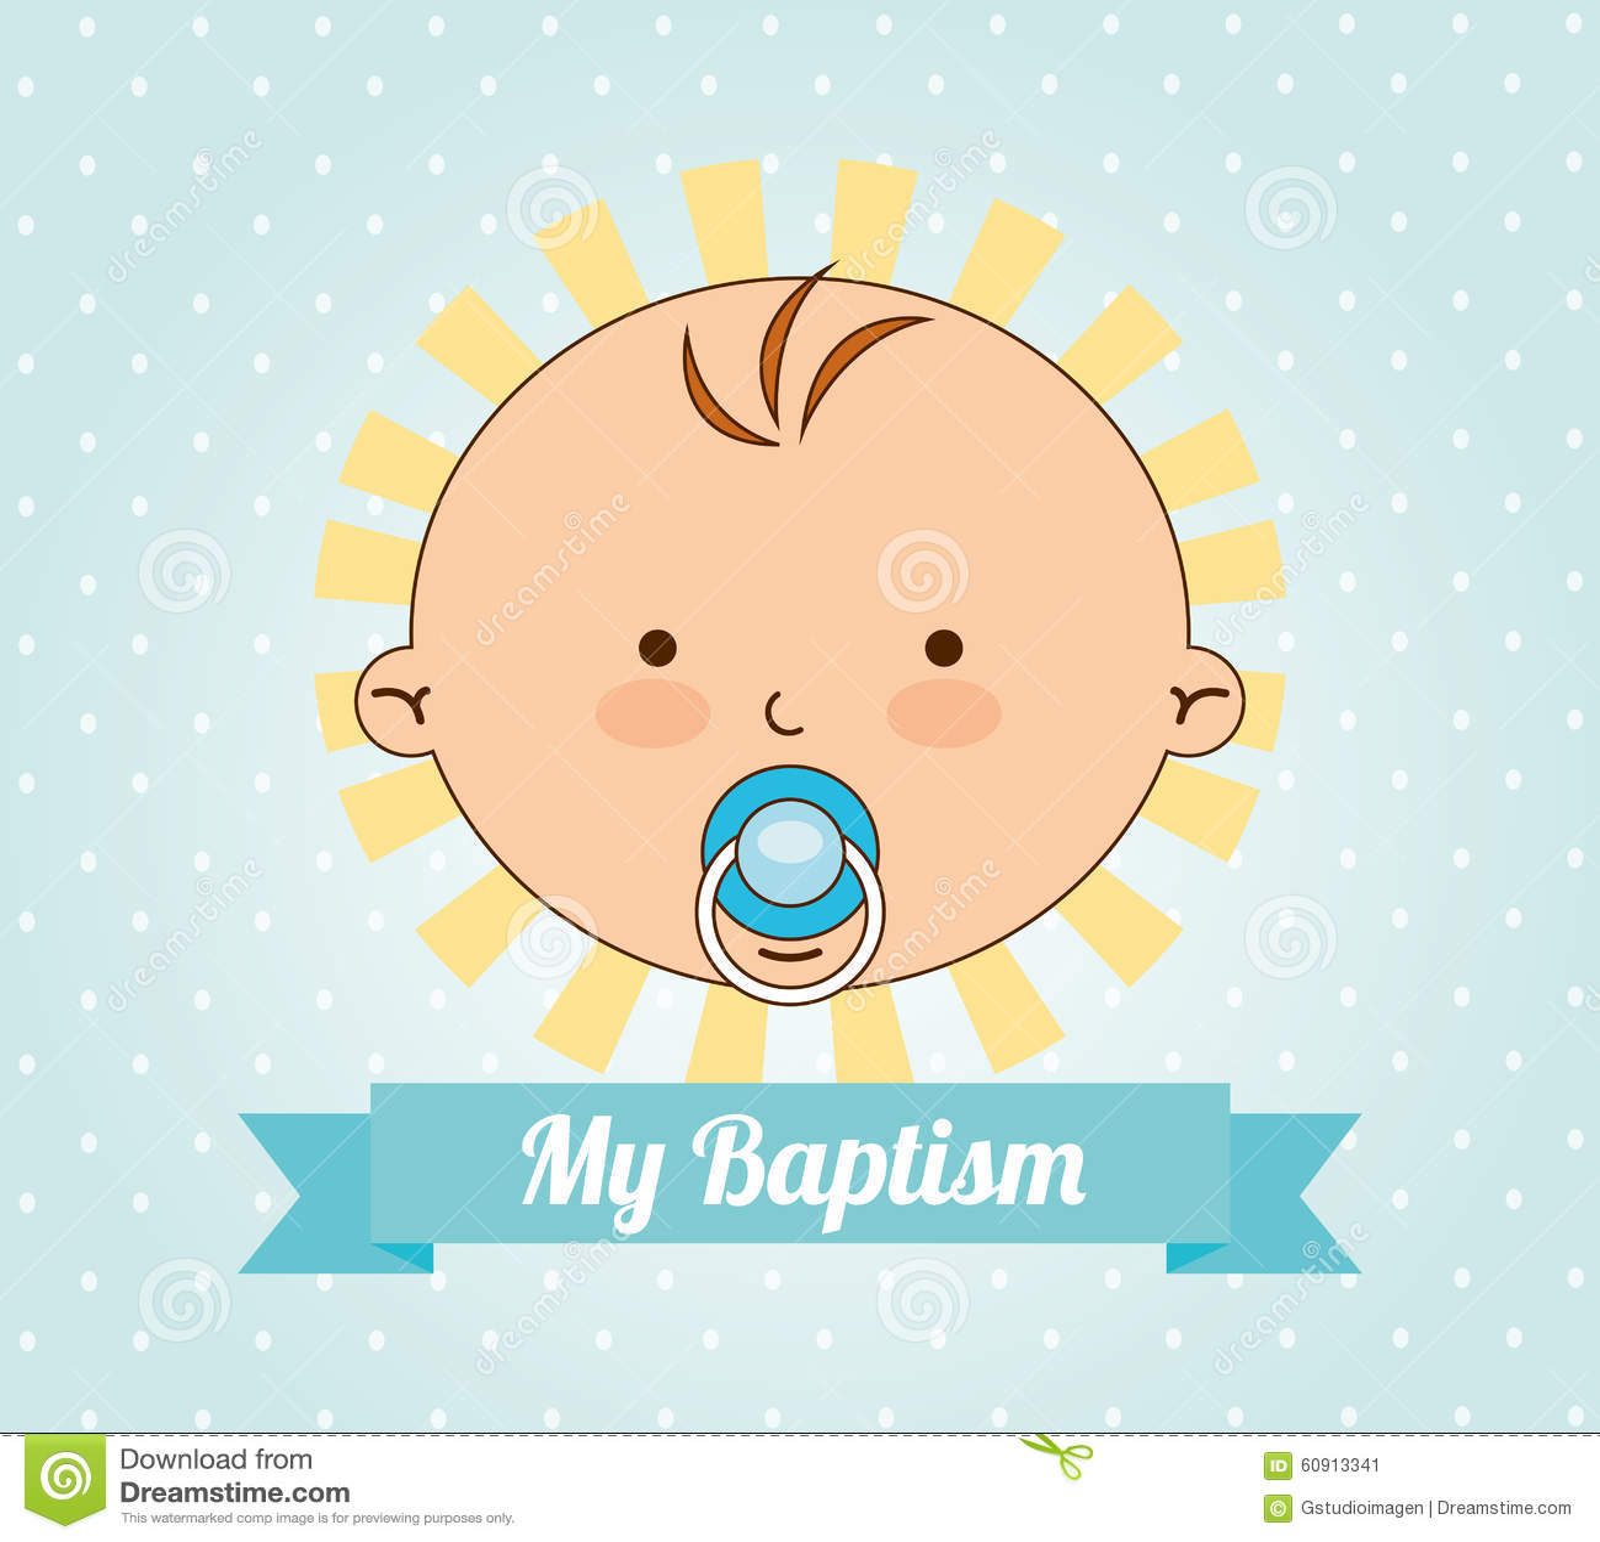 Baptism Invitation Design Stock Vector Illustration Of Religion